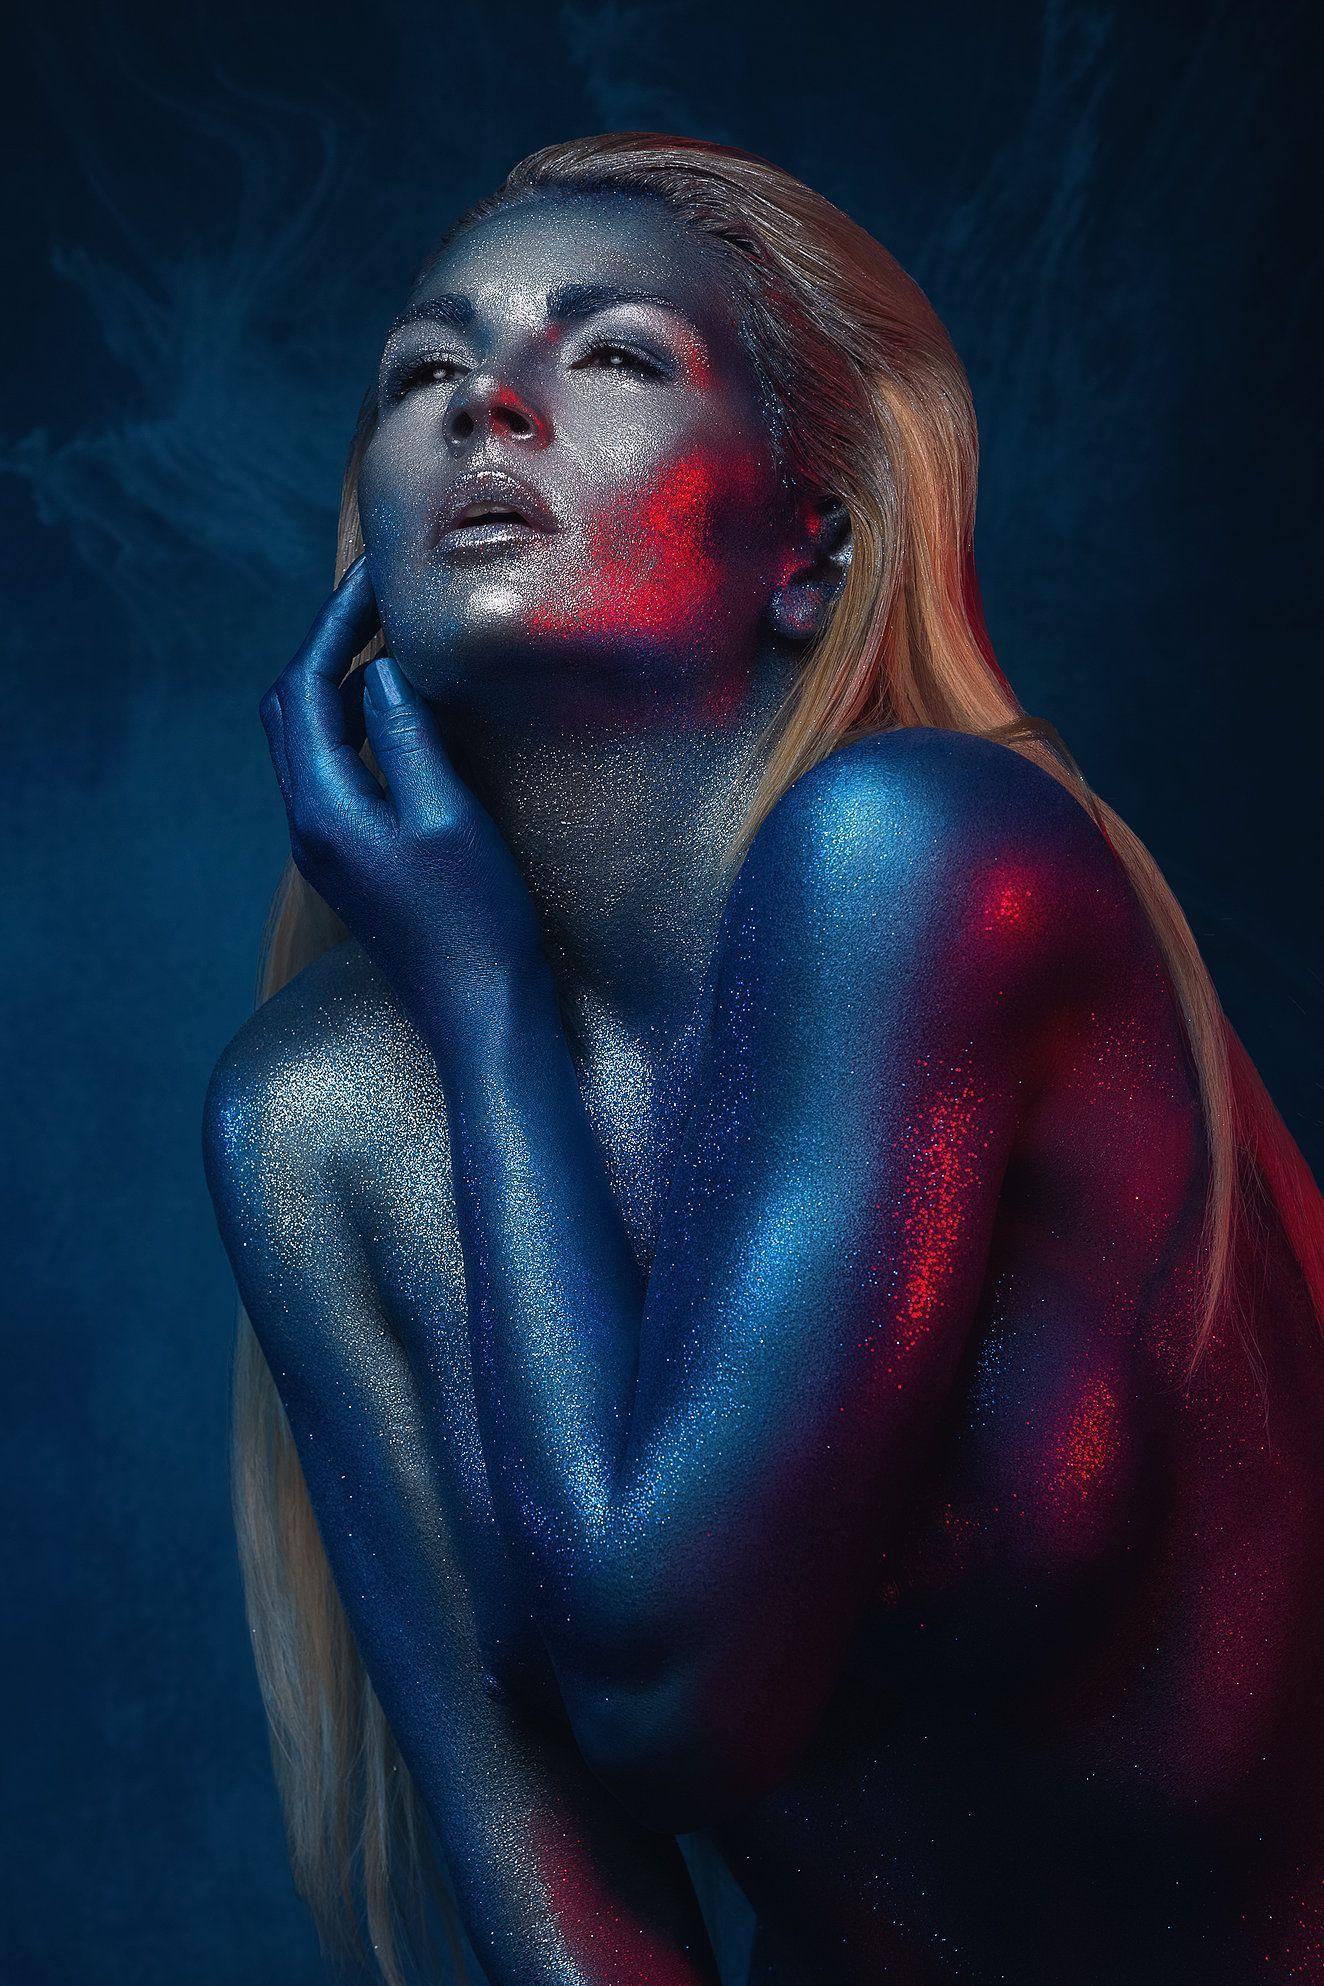 Risultati Immagini Per Glitter Body Painting Glitterbody Body Art Photography Body Painting Body Art